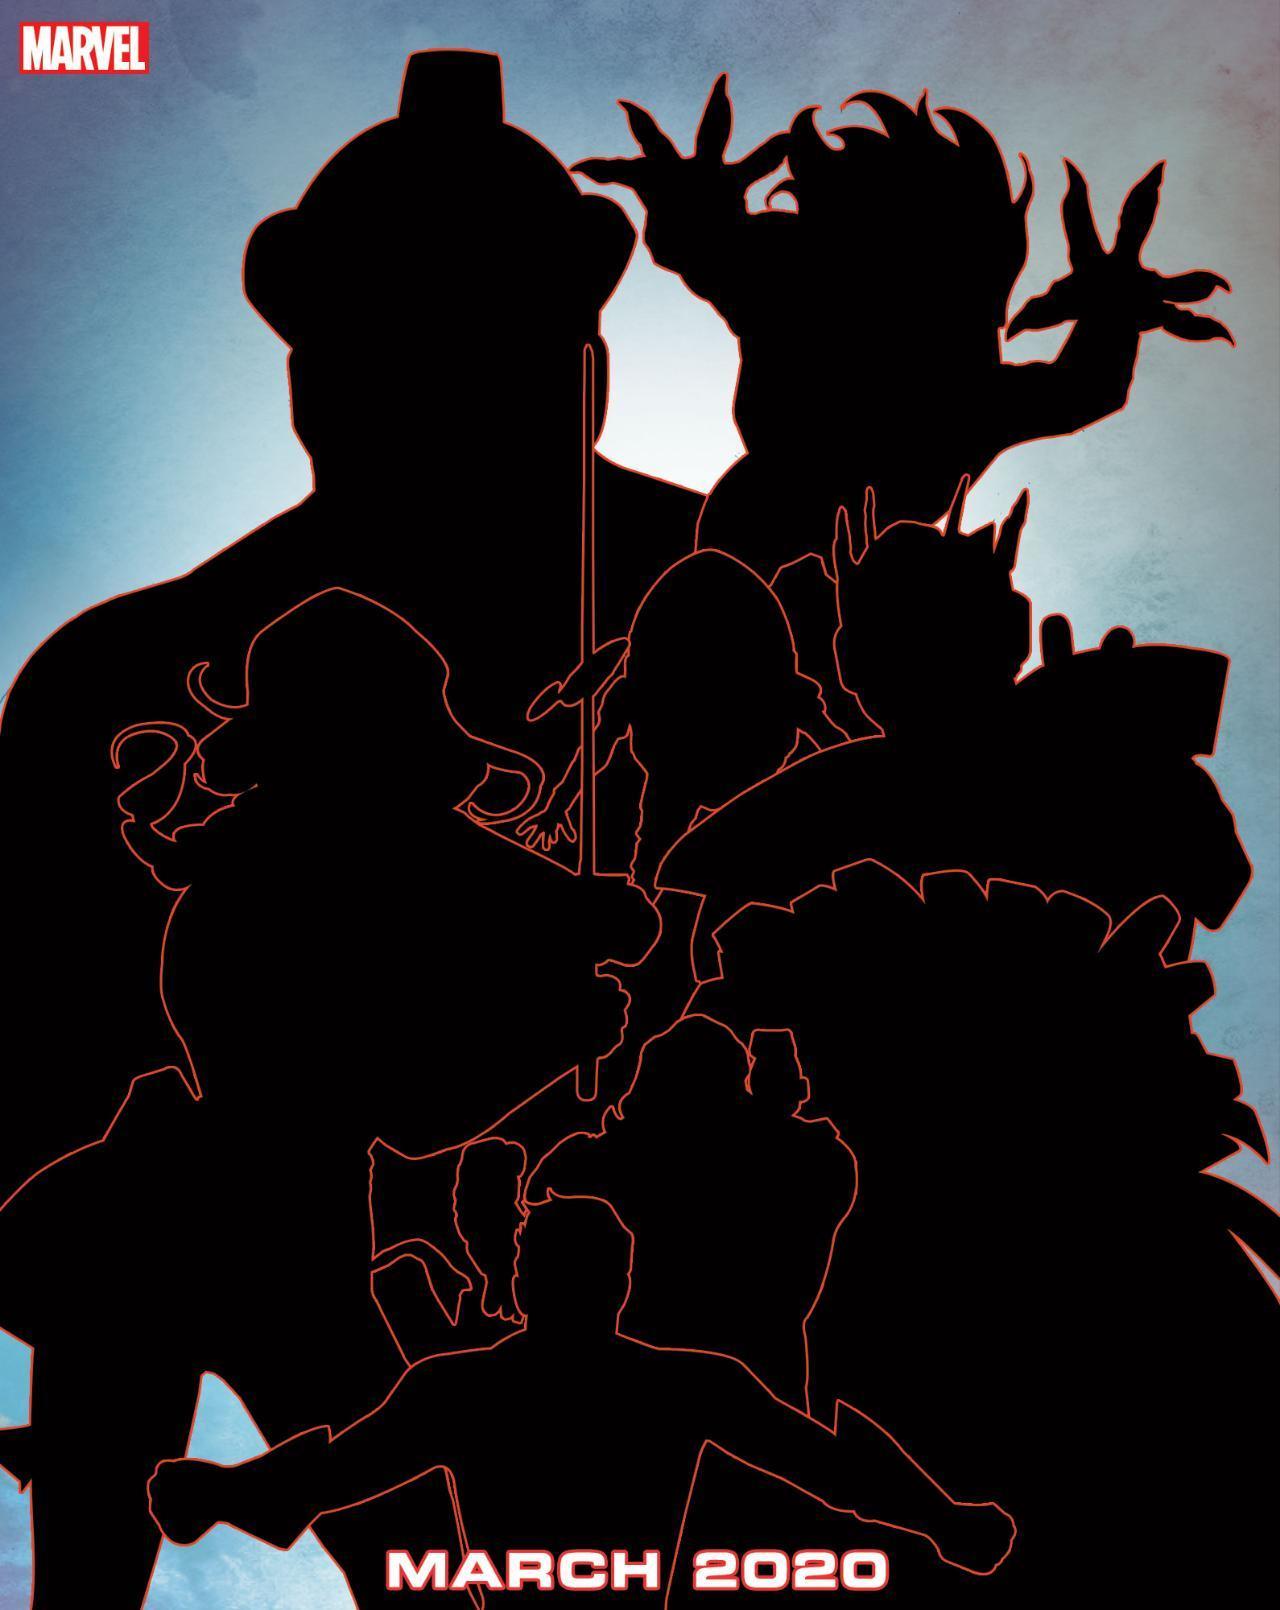 Marvel тизерят новую команду Людей Икс